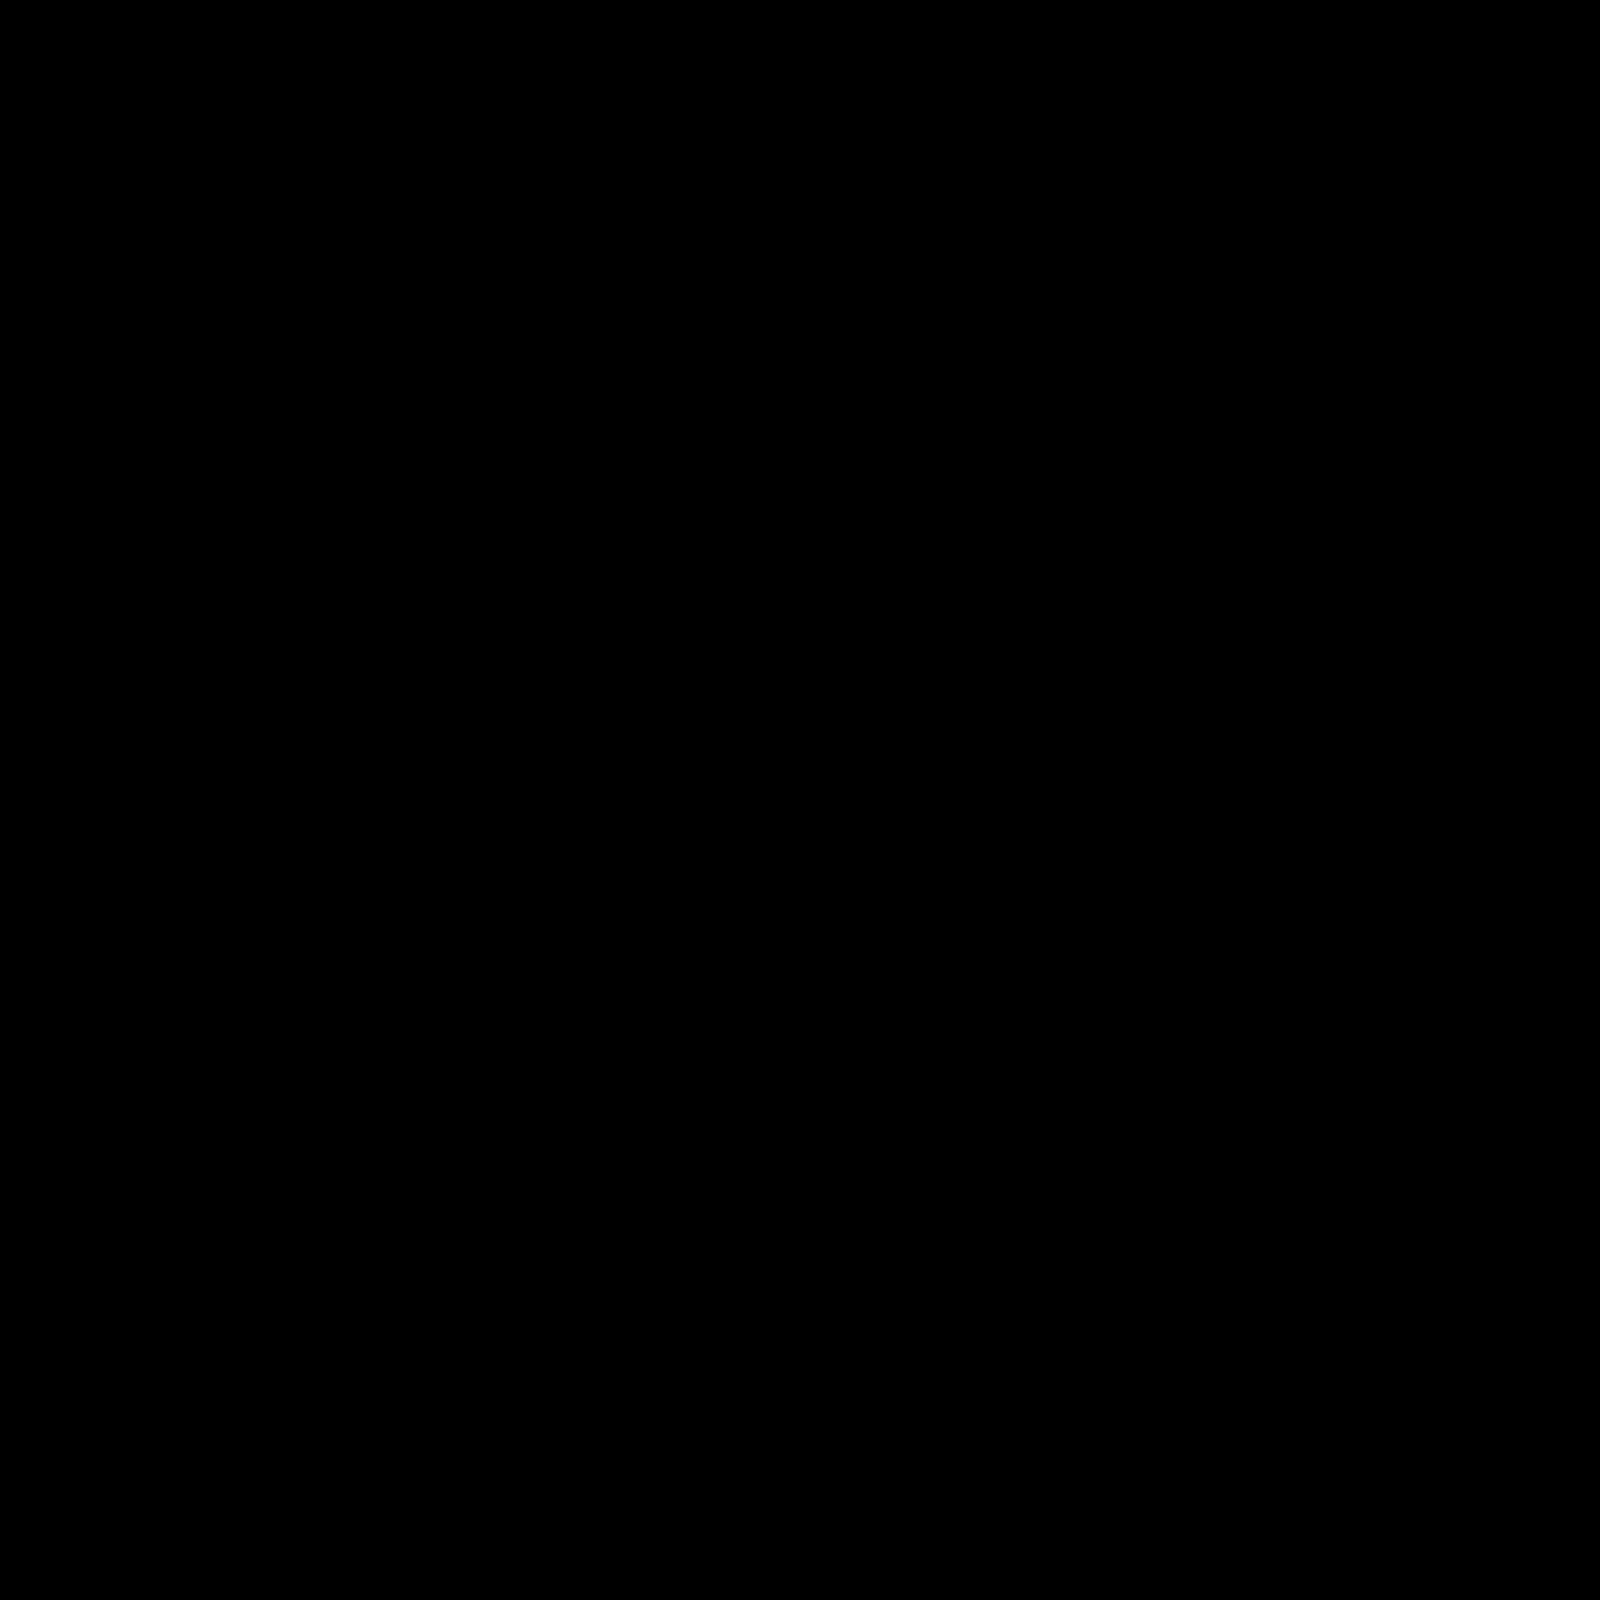 Carpeta de gemas icon